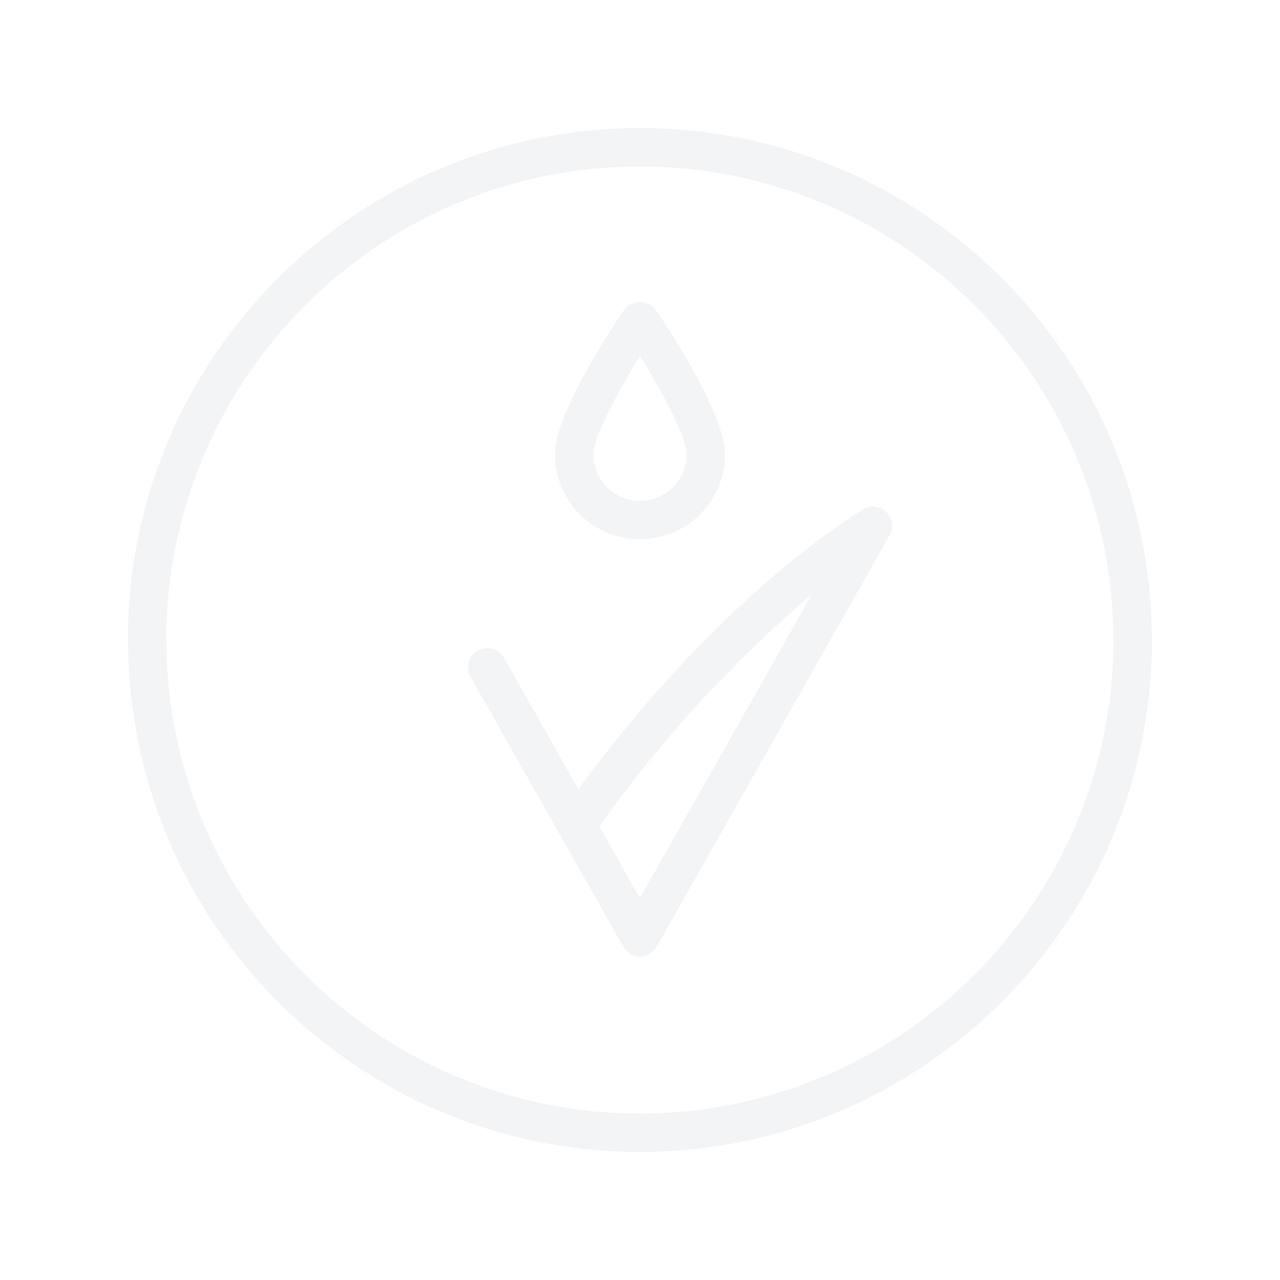 RICH Pure Luxury Volumising Texture Shake тонизирующий спрей для текстуры волос 145ml